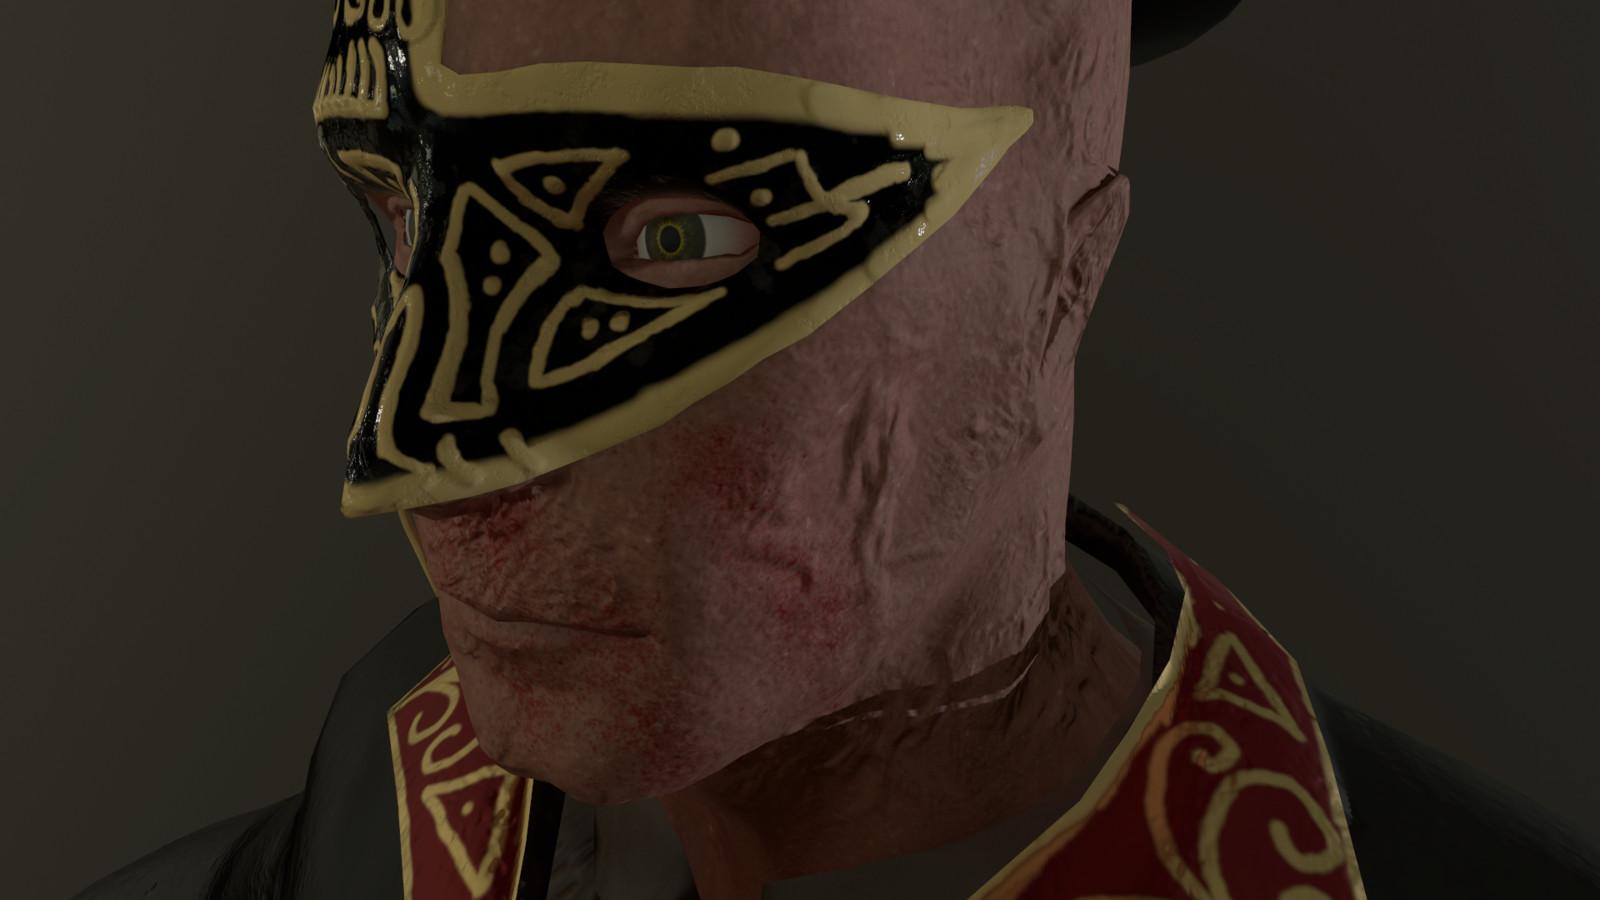 Face Detail & Masquerade Mask (Left Side)